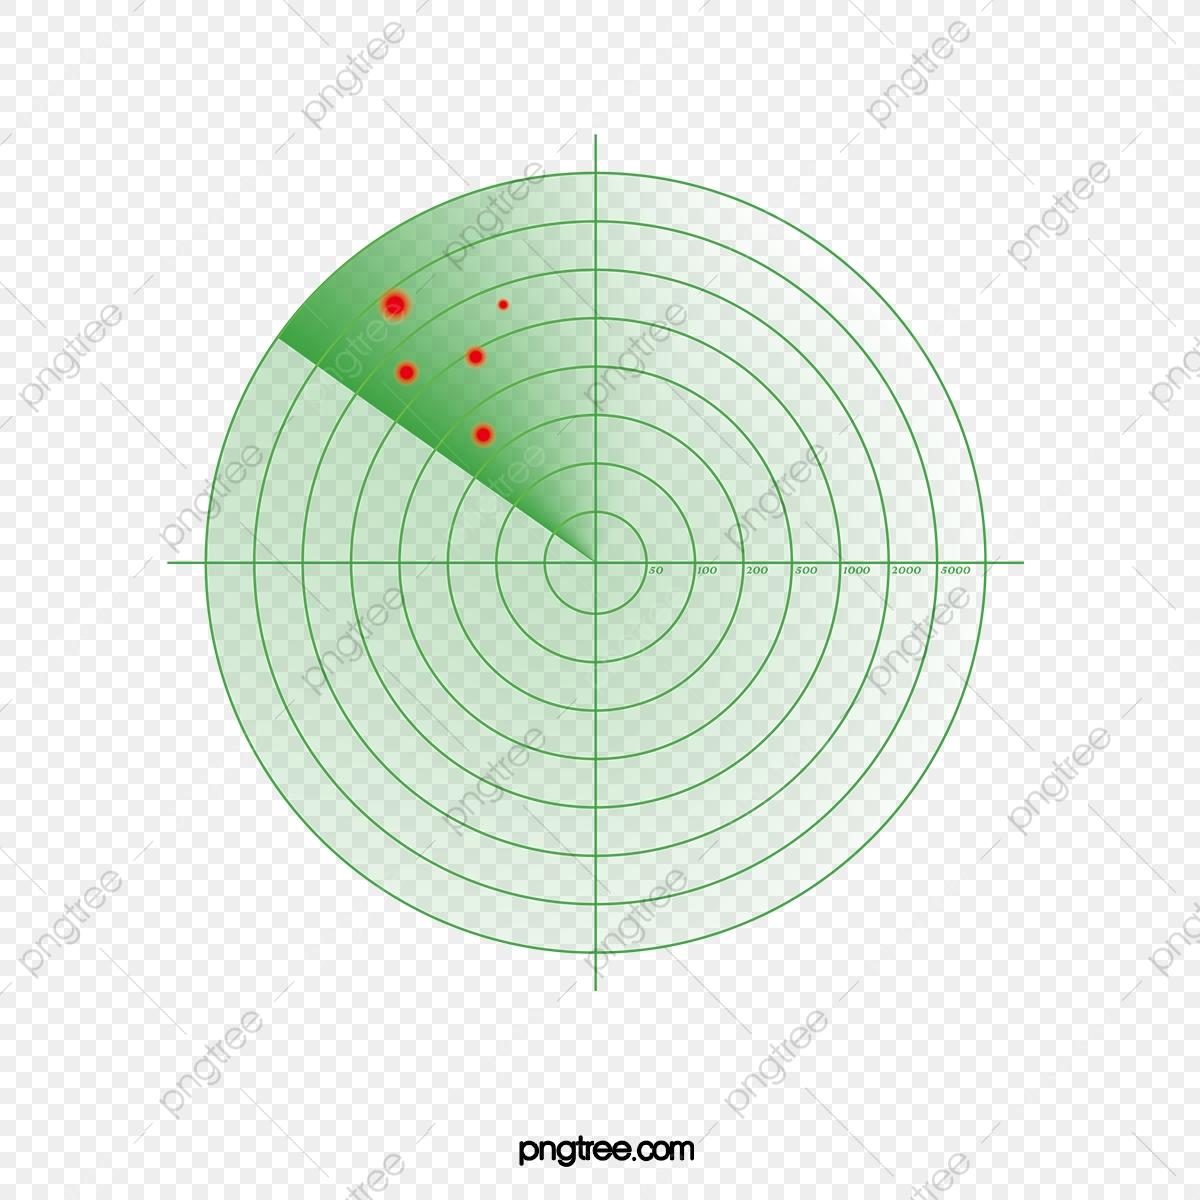 Radar Scan Material, Radar Scan Picture, Radar Scanning.